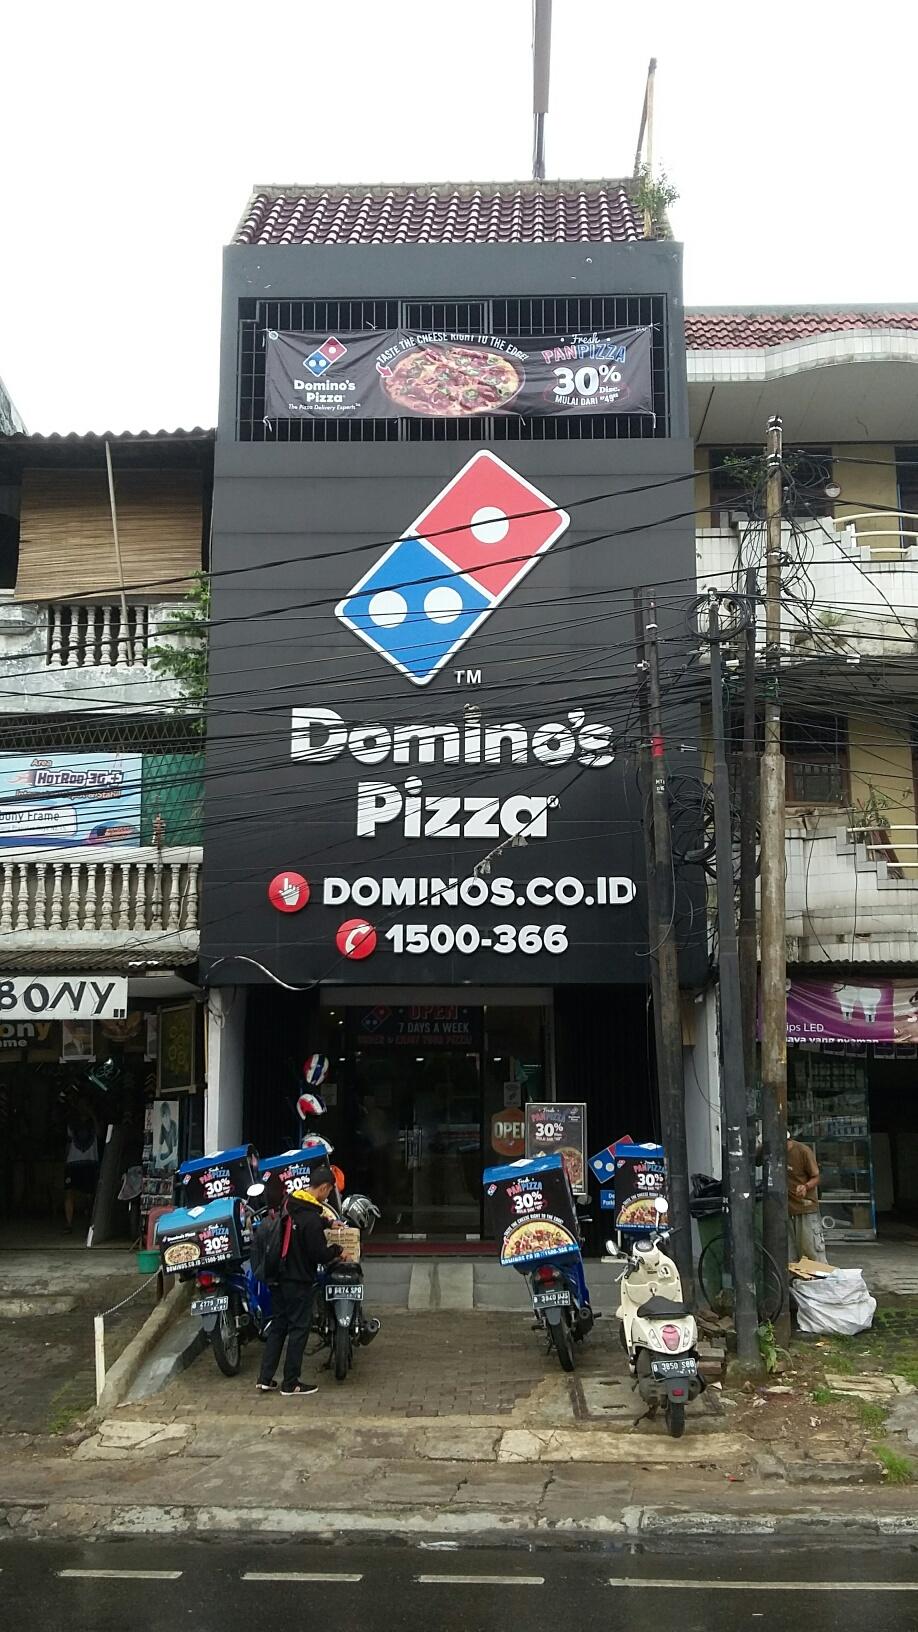 Domino's Pizza - Mampang Prpt, Jakarta Selatan